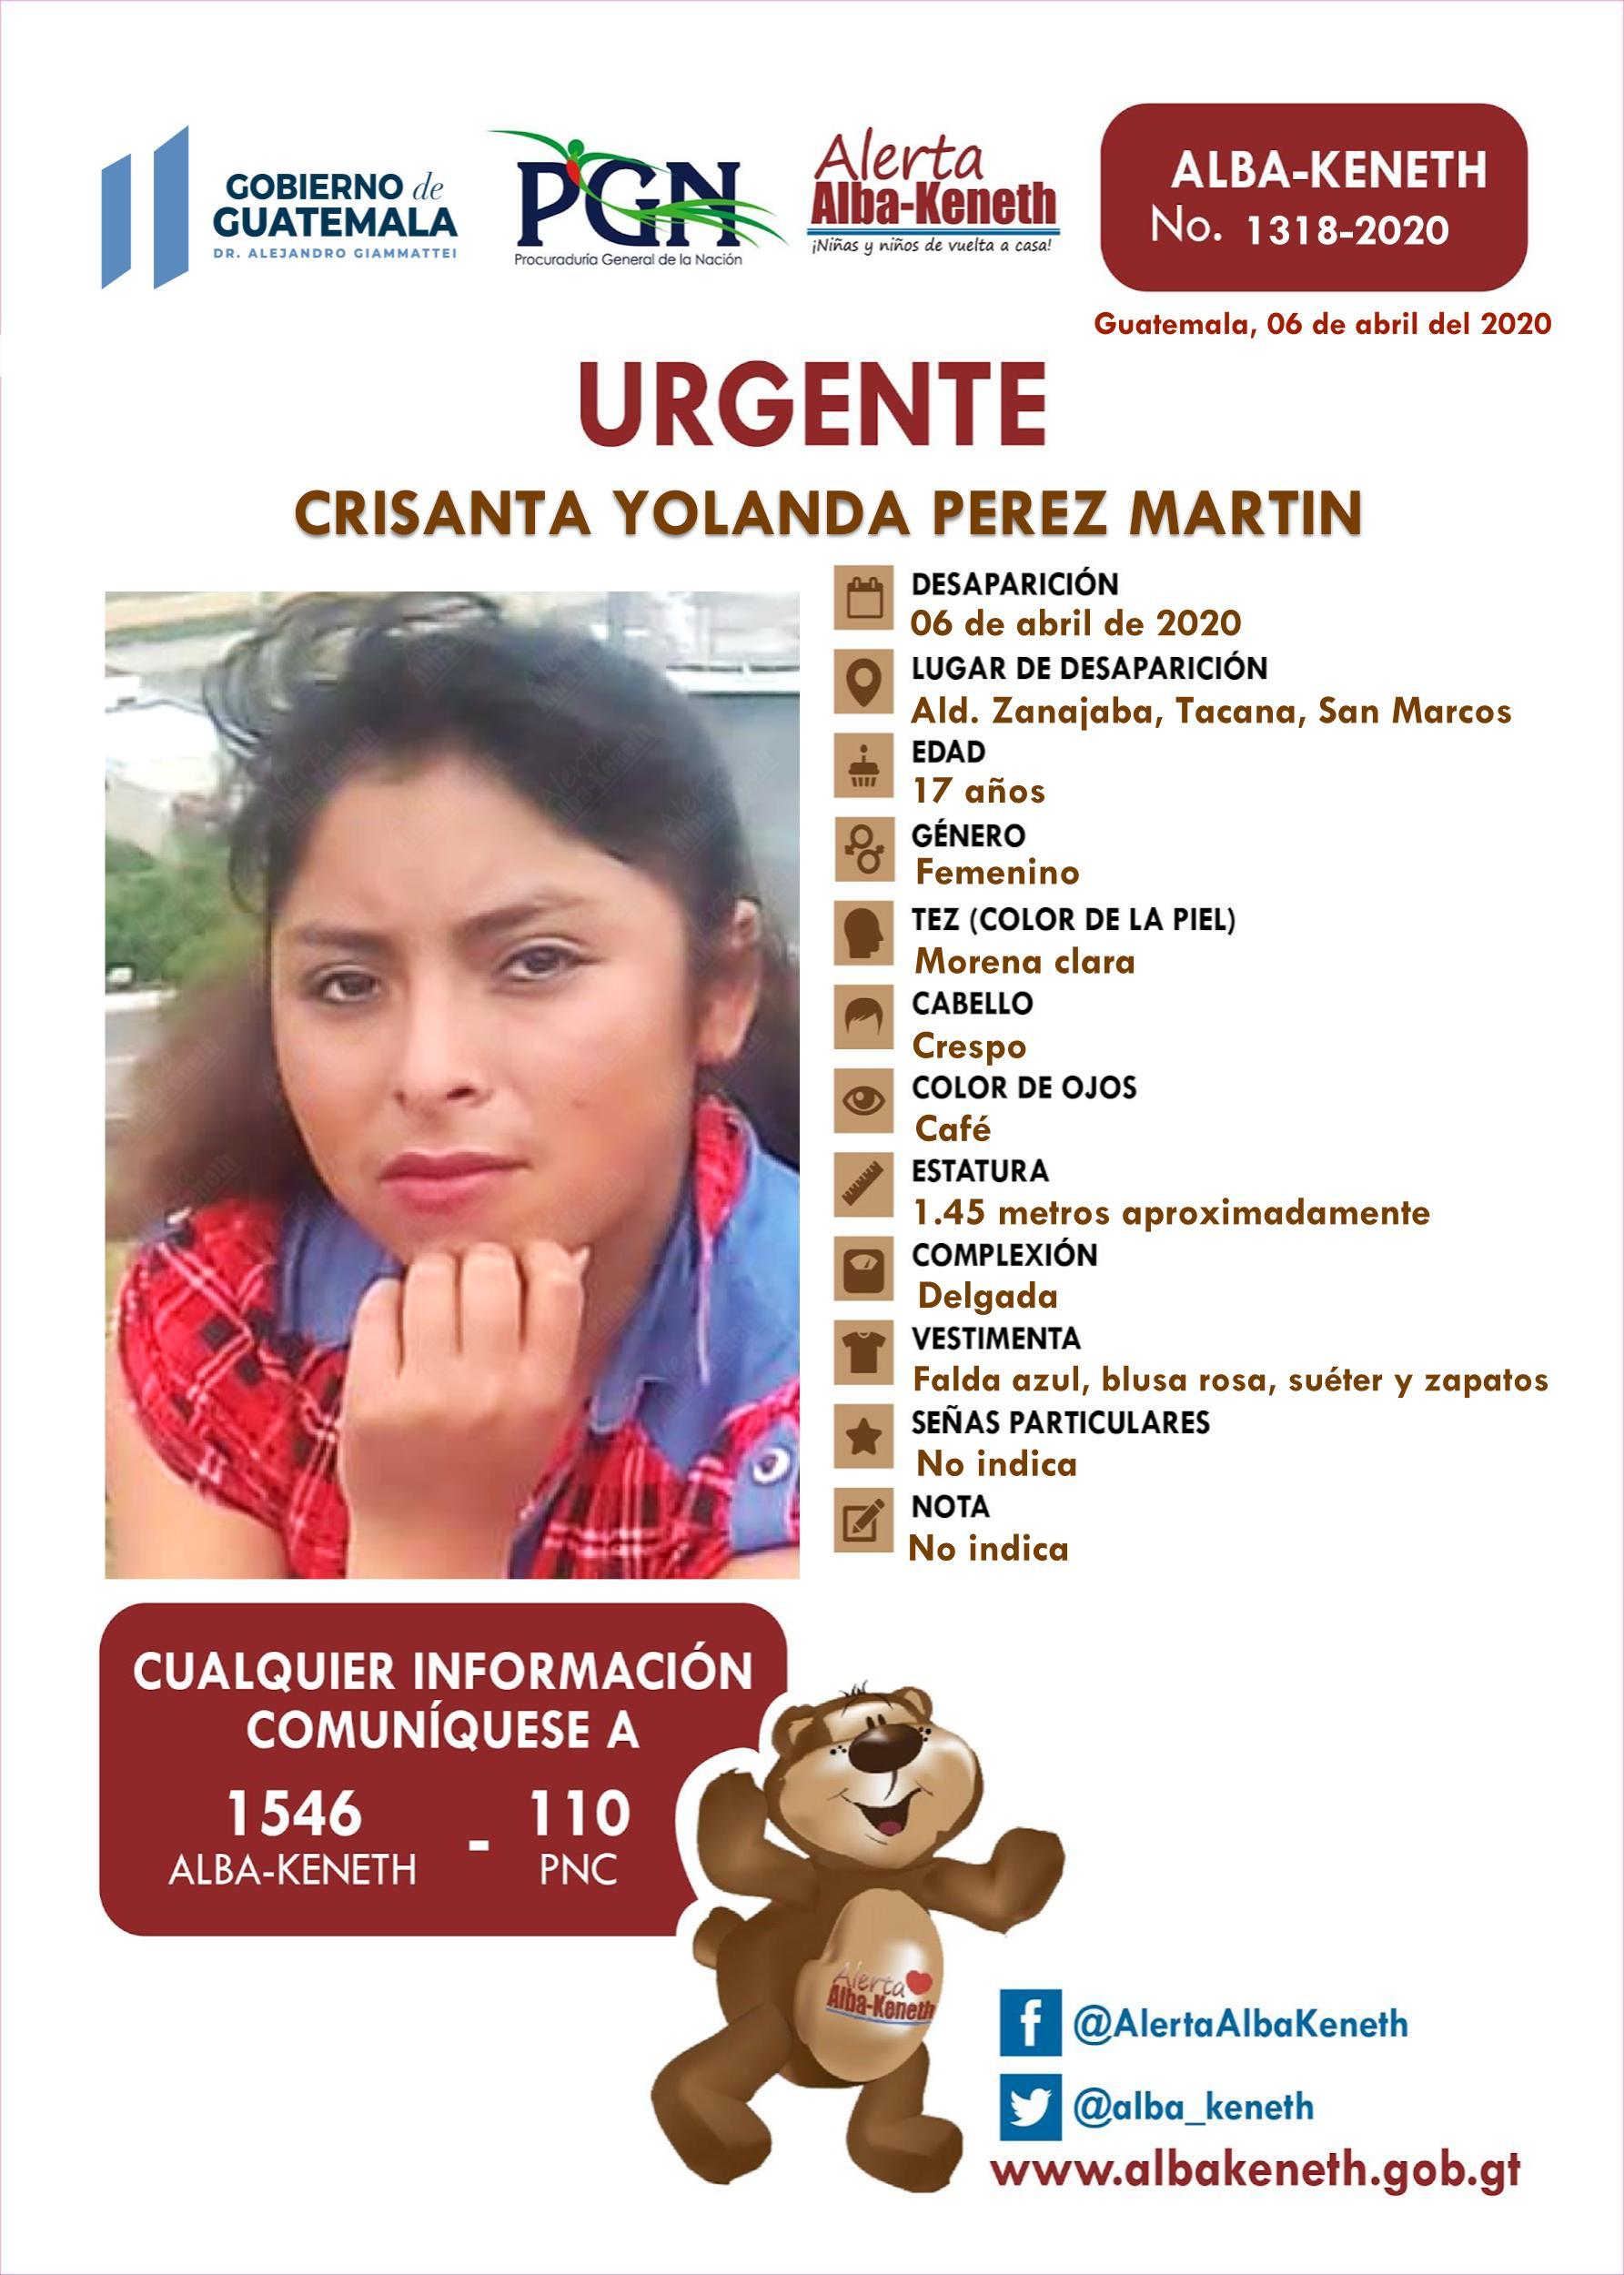 Crisanta Yolanda Perez Martin